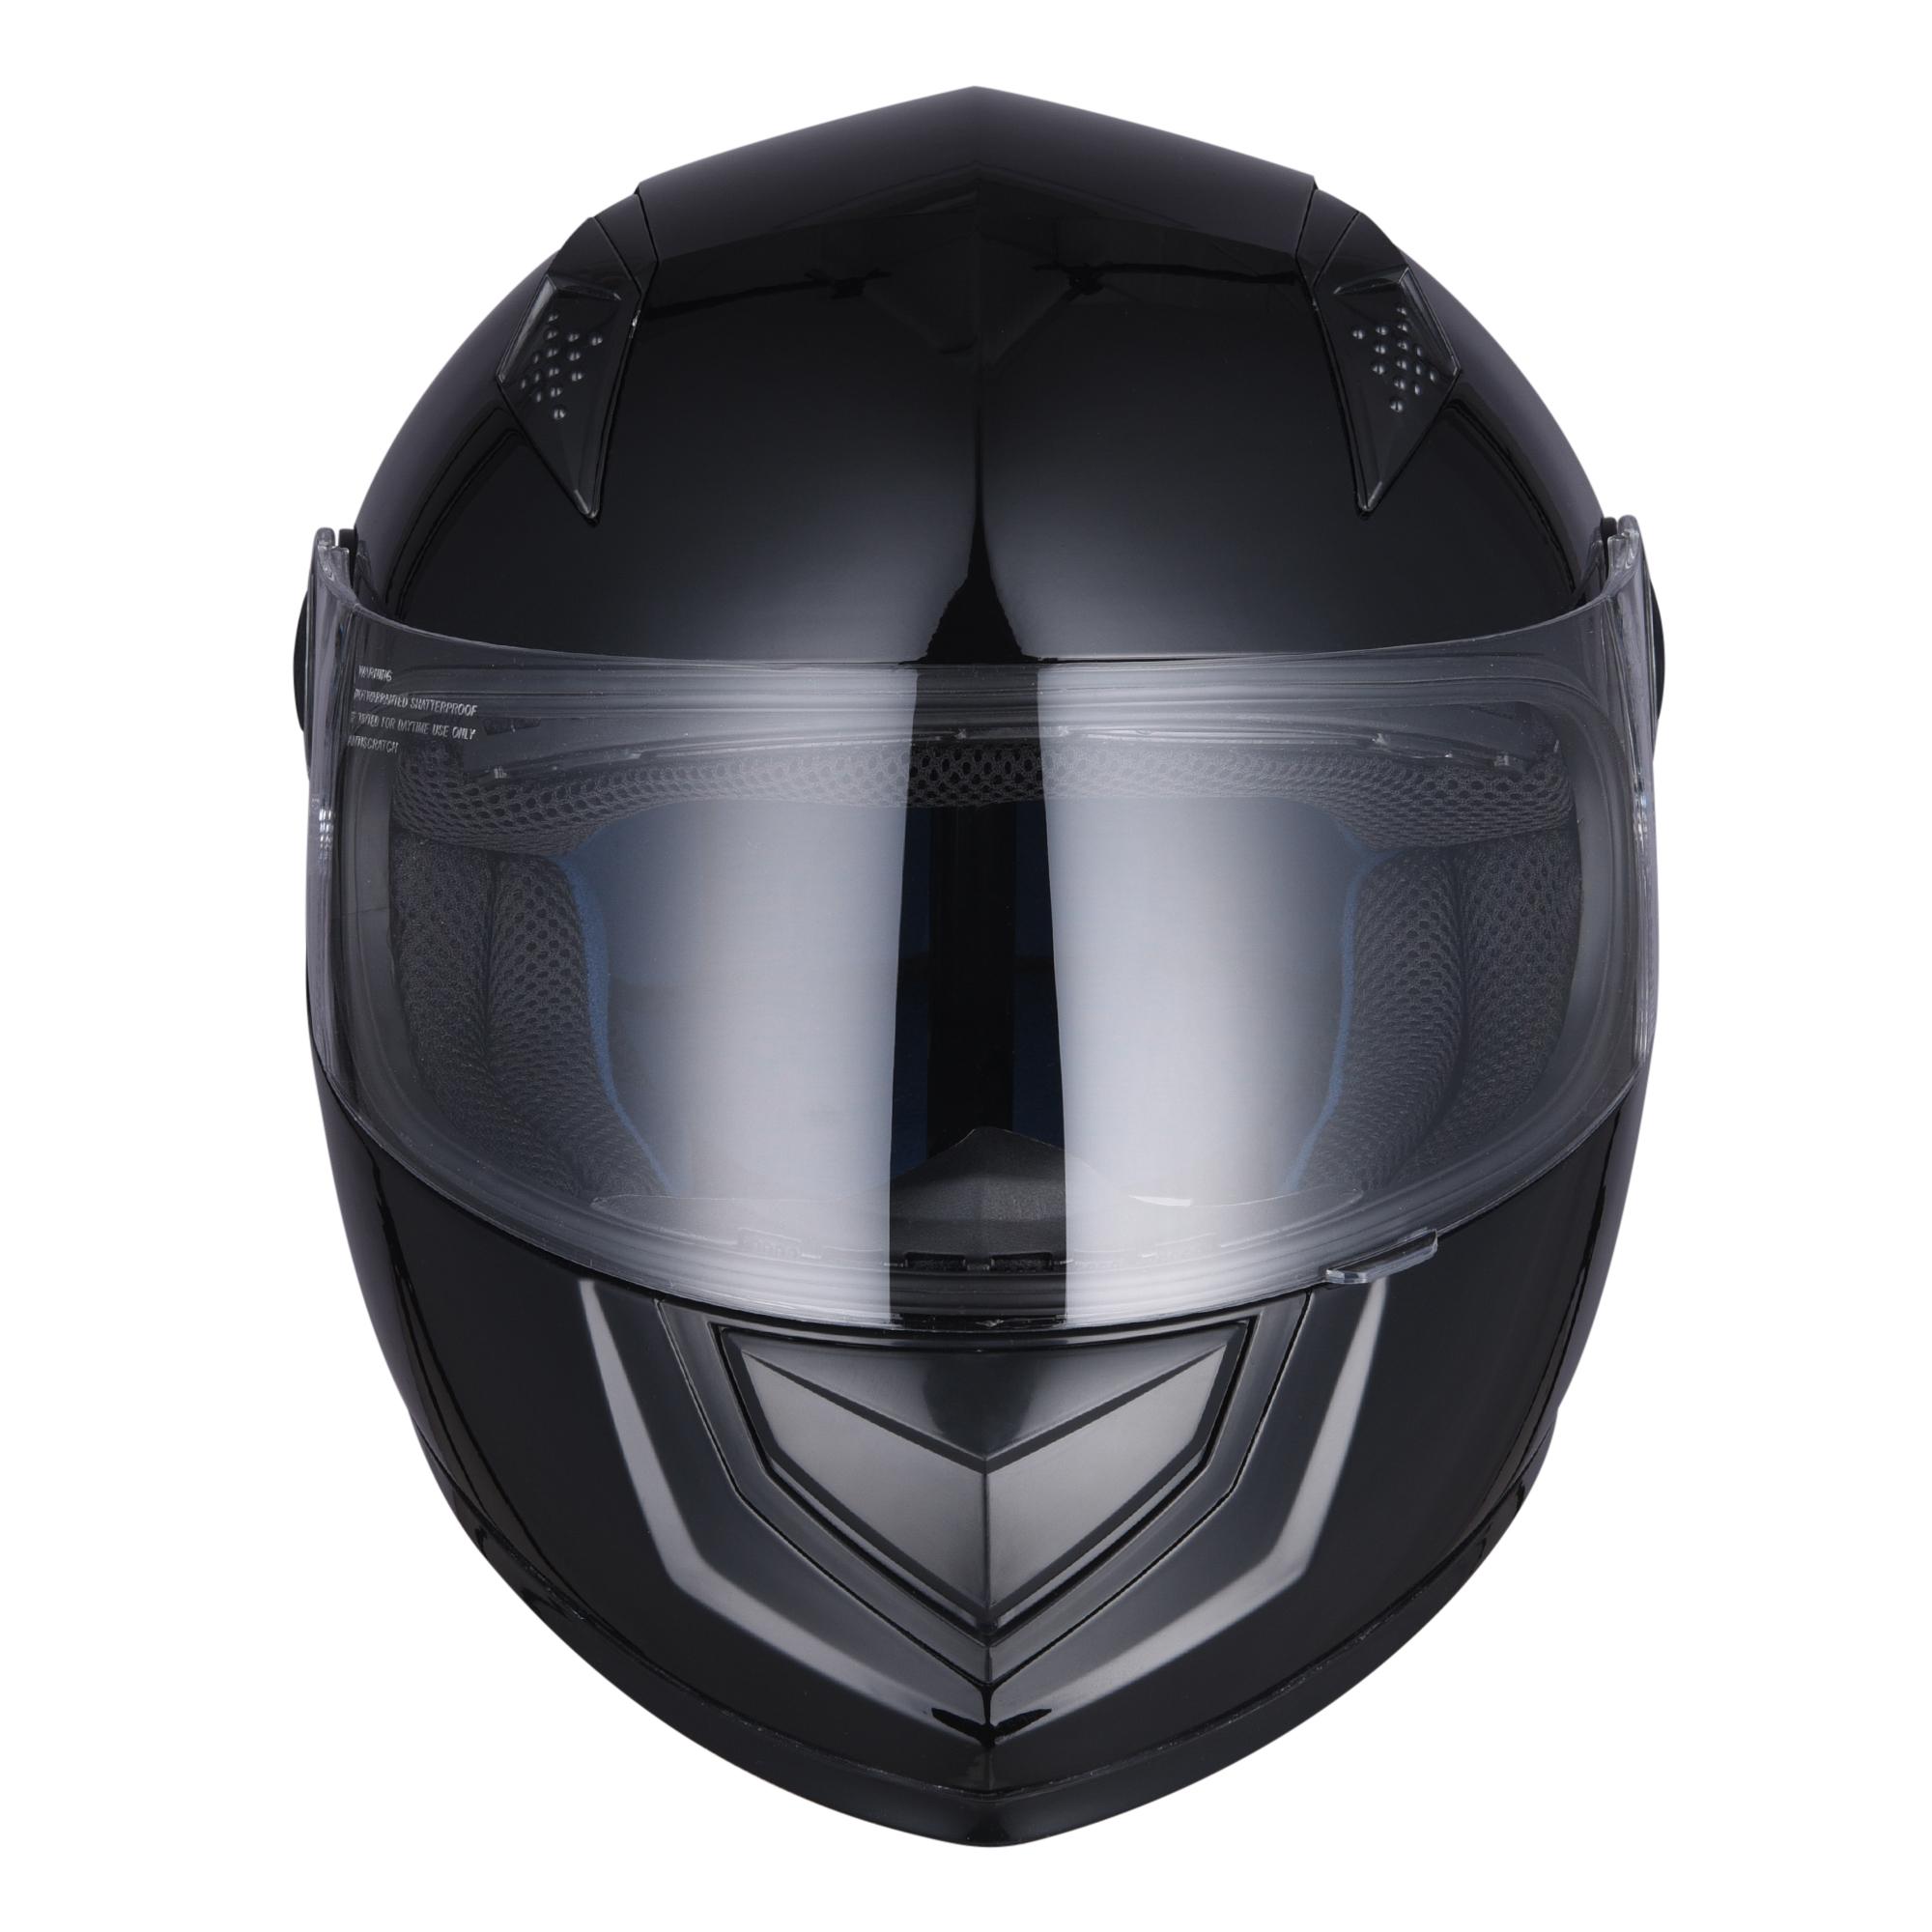 miniature 121 - AHR K12 Full Face Motorcycle Helmet DOT Air Vents Clear Visor Racing S M L XL